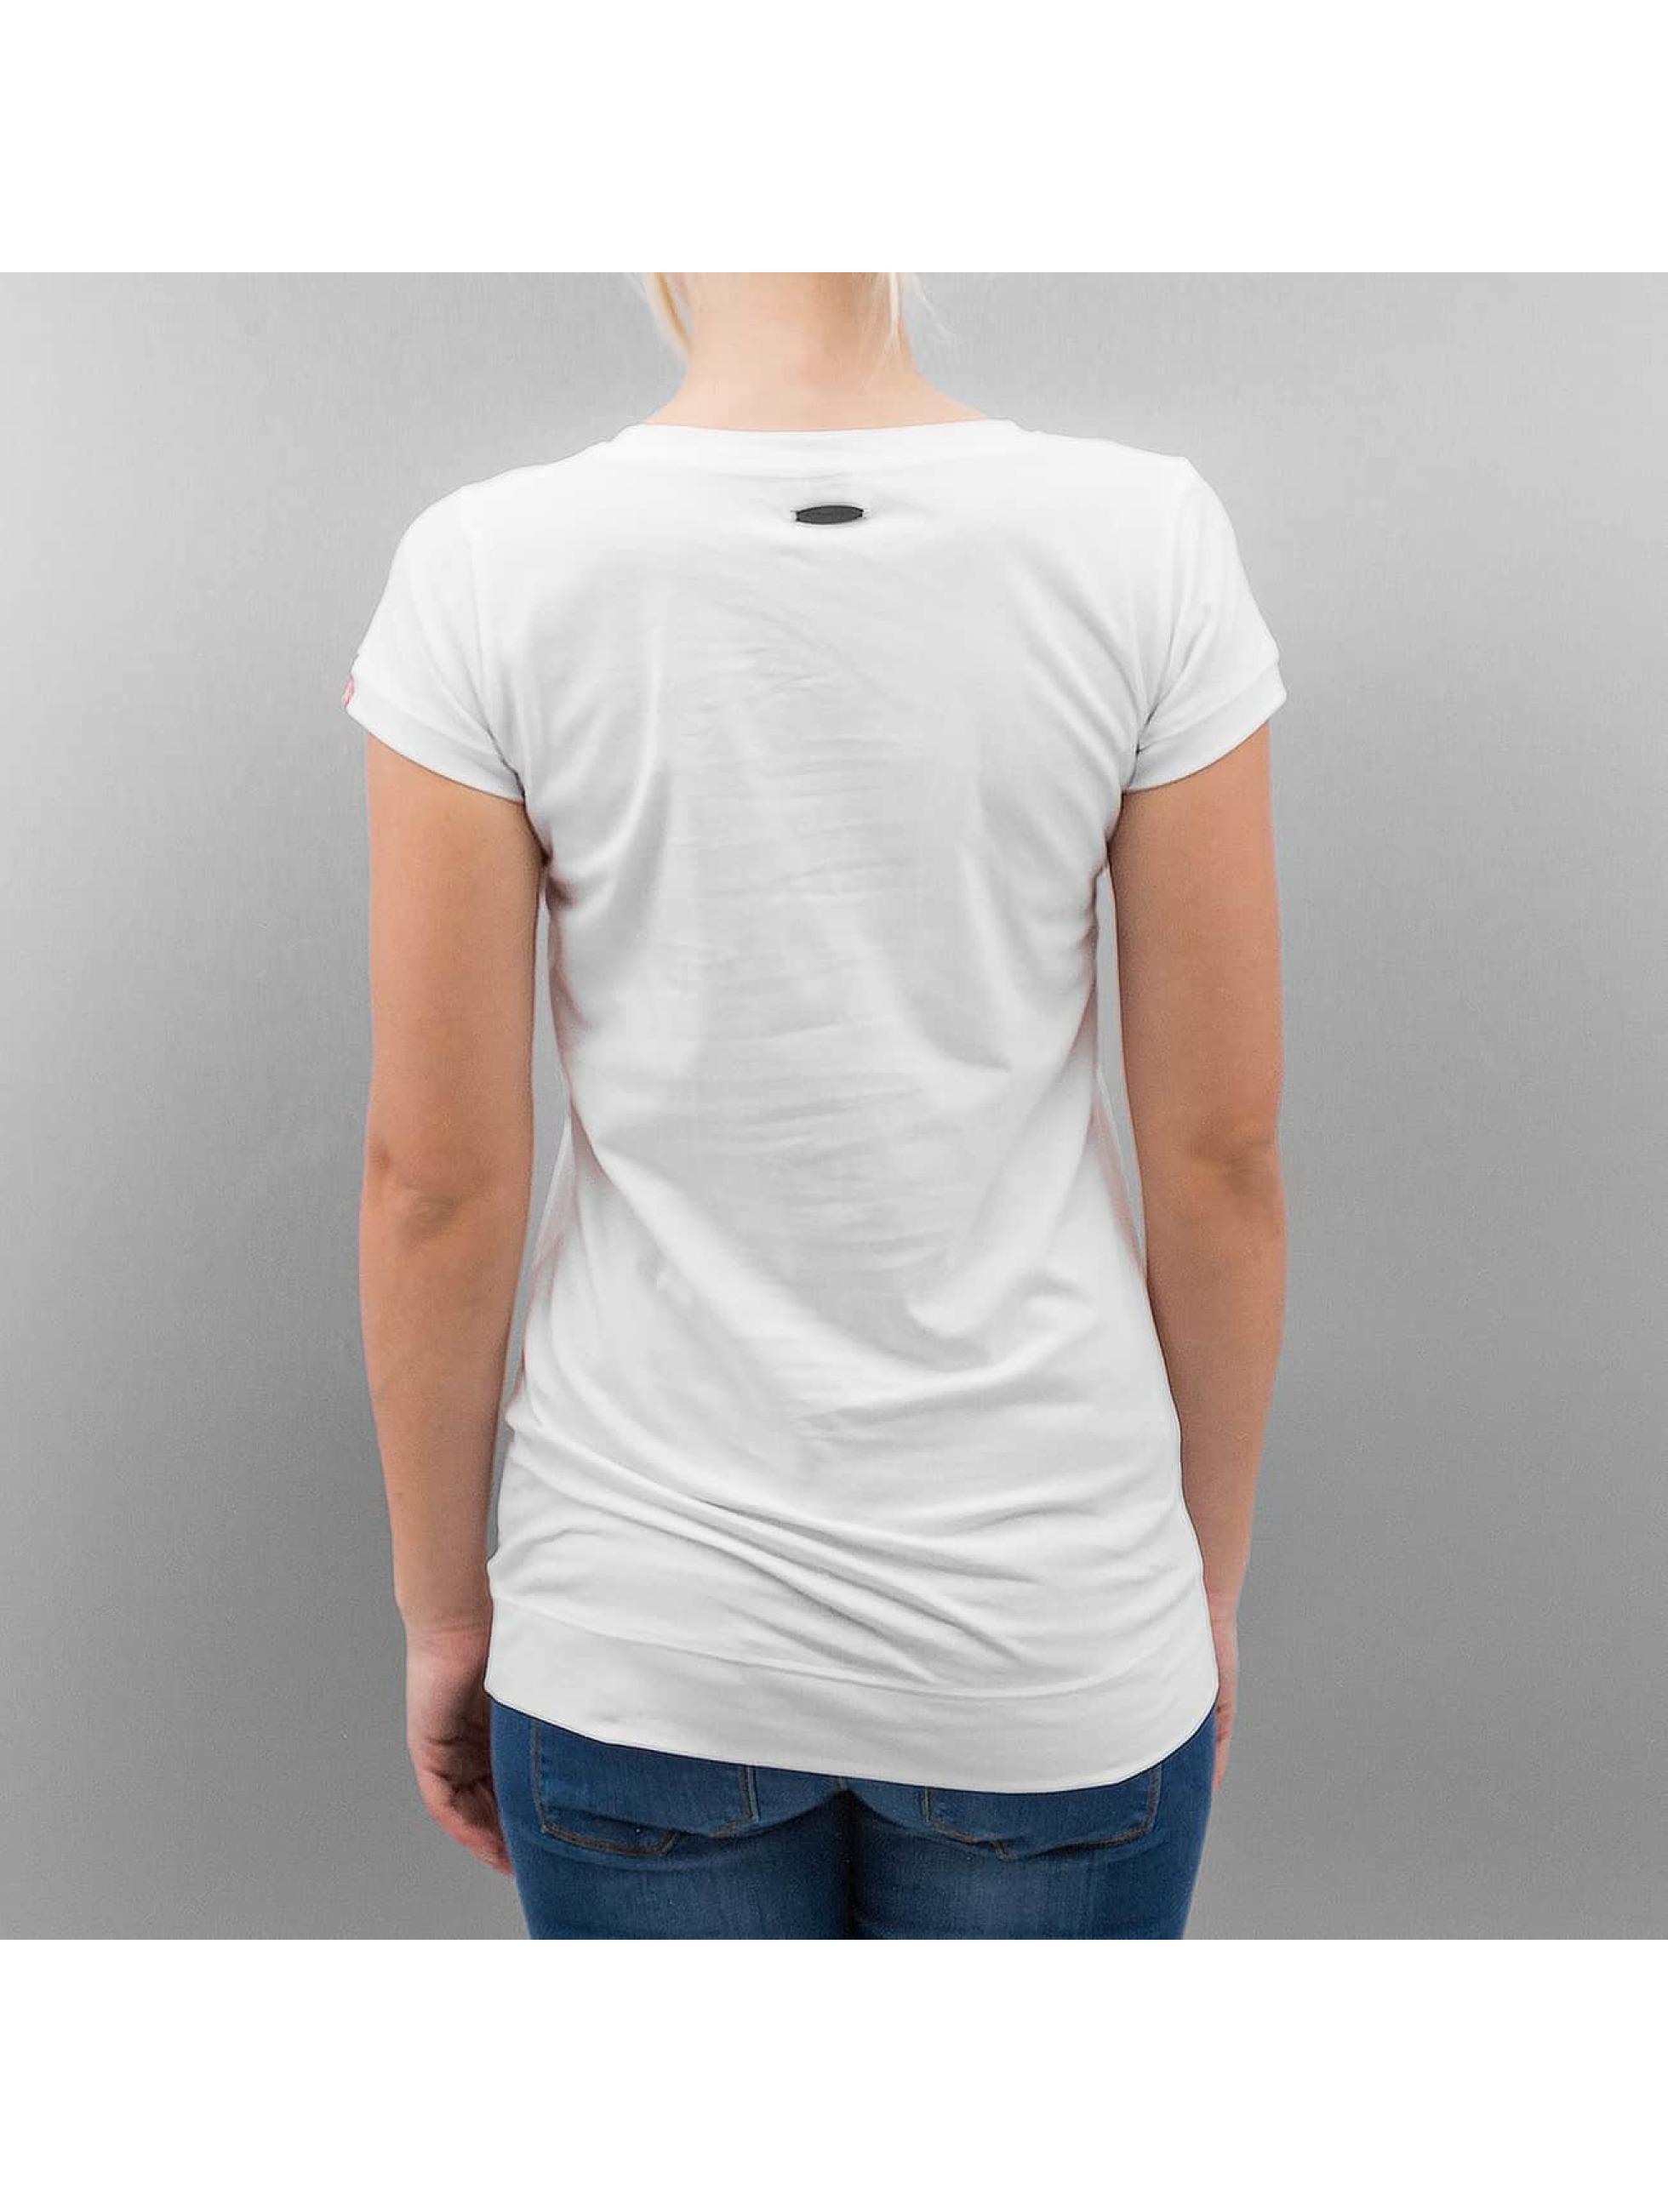 Alife & Kickin T-Shirt Coco white